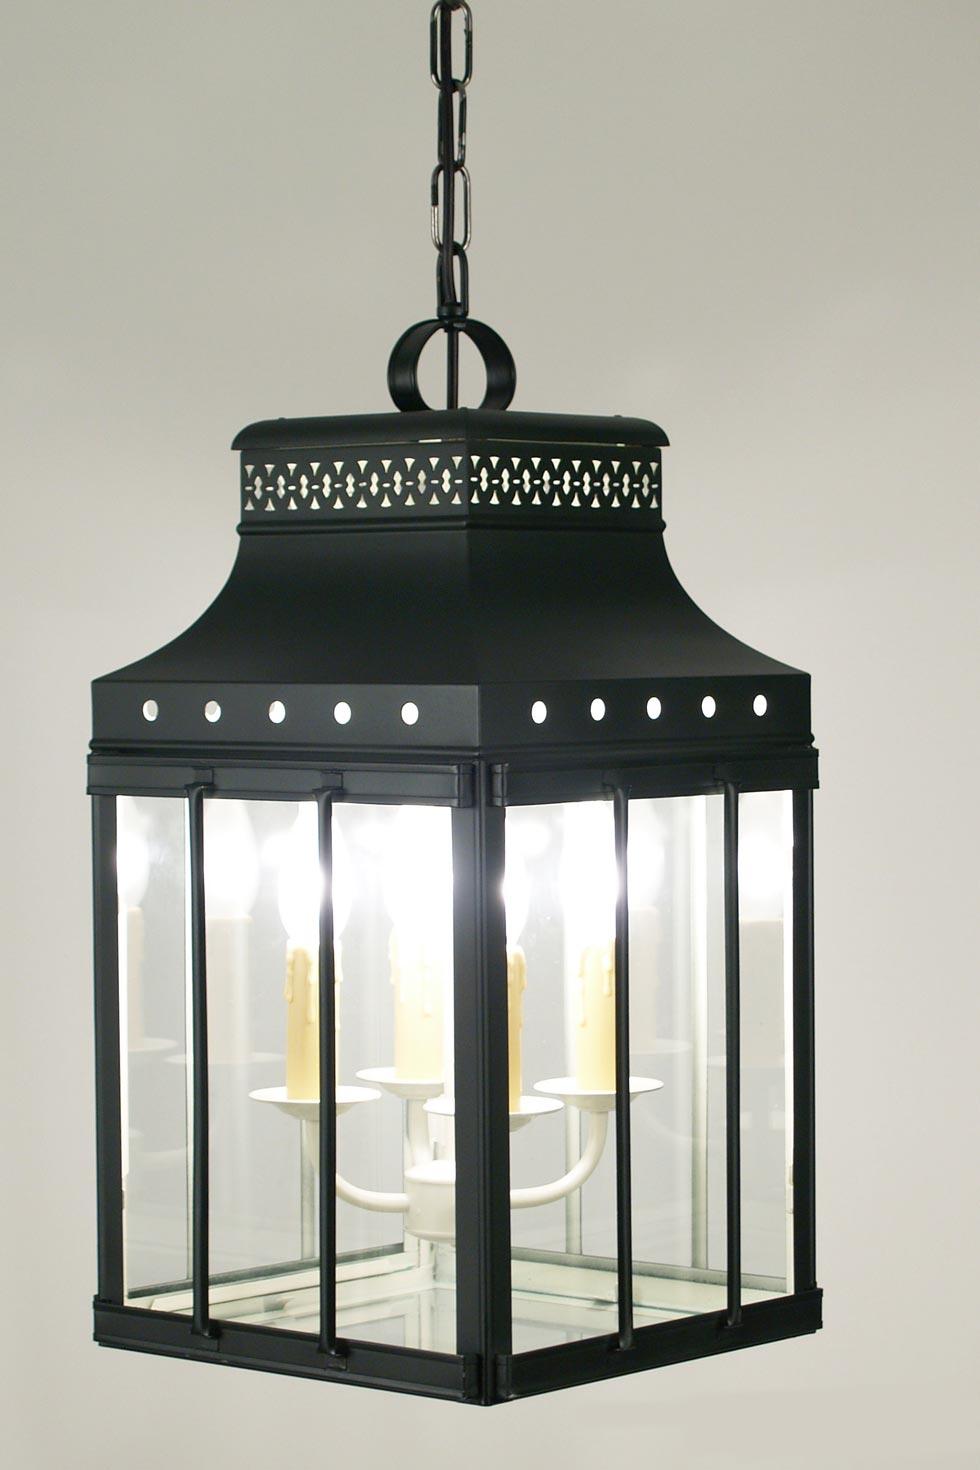 roma lanterne noire en laiton laqu latoaria laiton naturel suspension r f 11040003. Black Bedroom Furniture Sets. Home Design Ideas